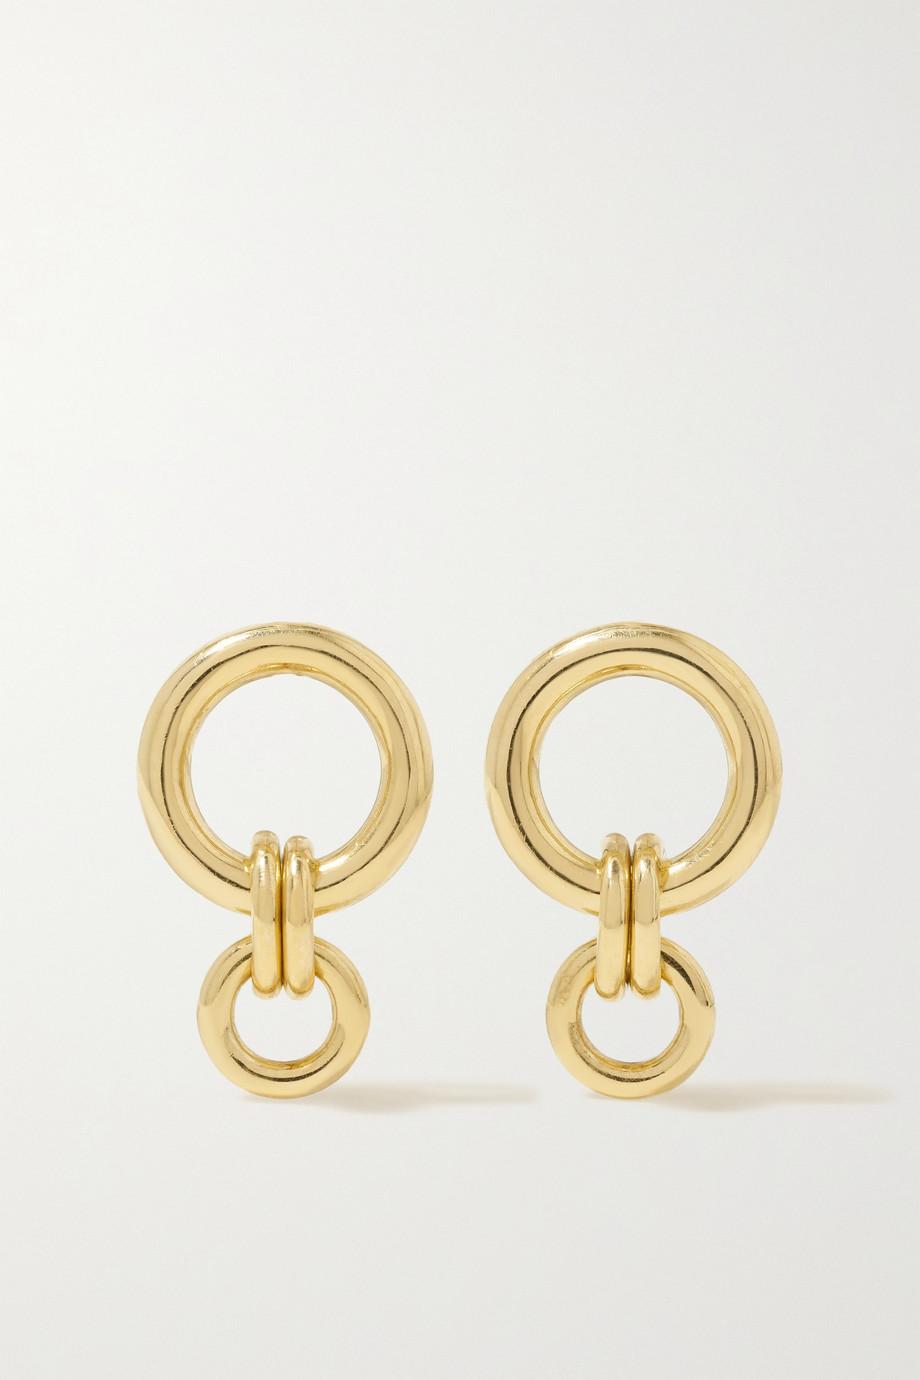 Spinelli Kilcollin Canis Ohrringe aus 18 Karat Gold